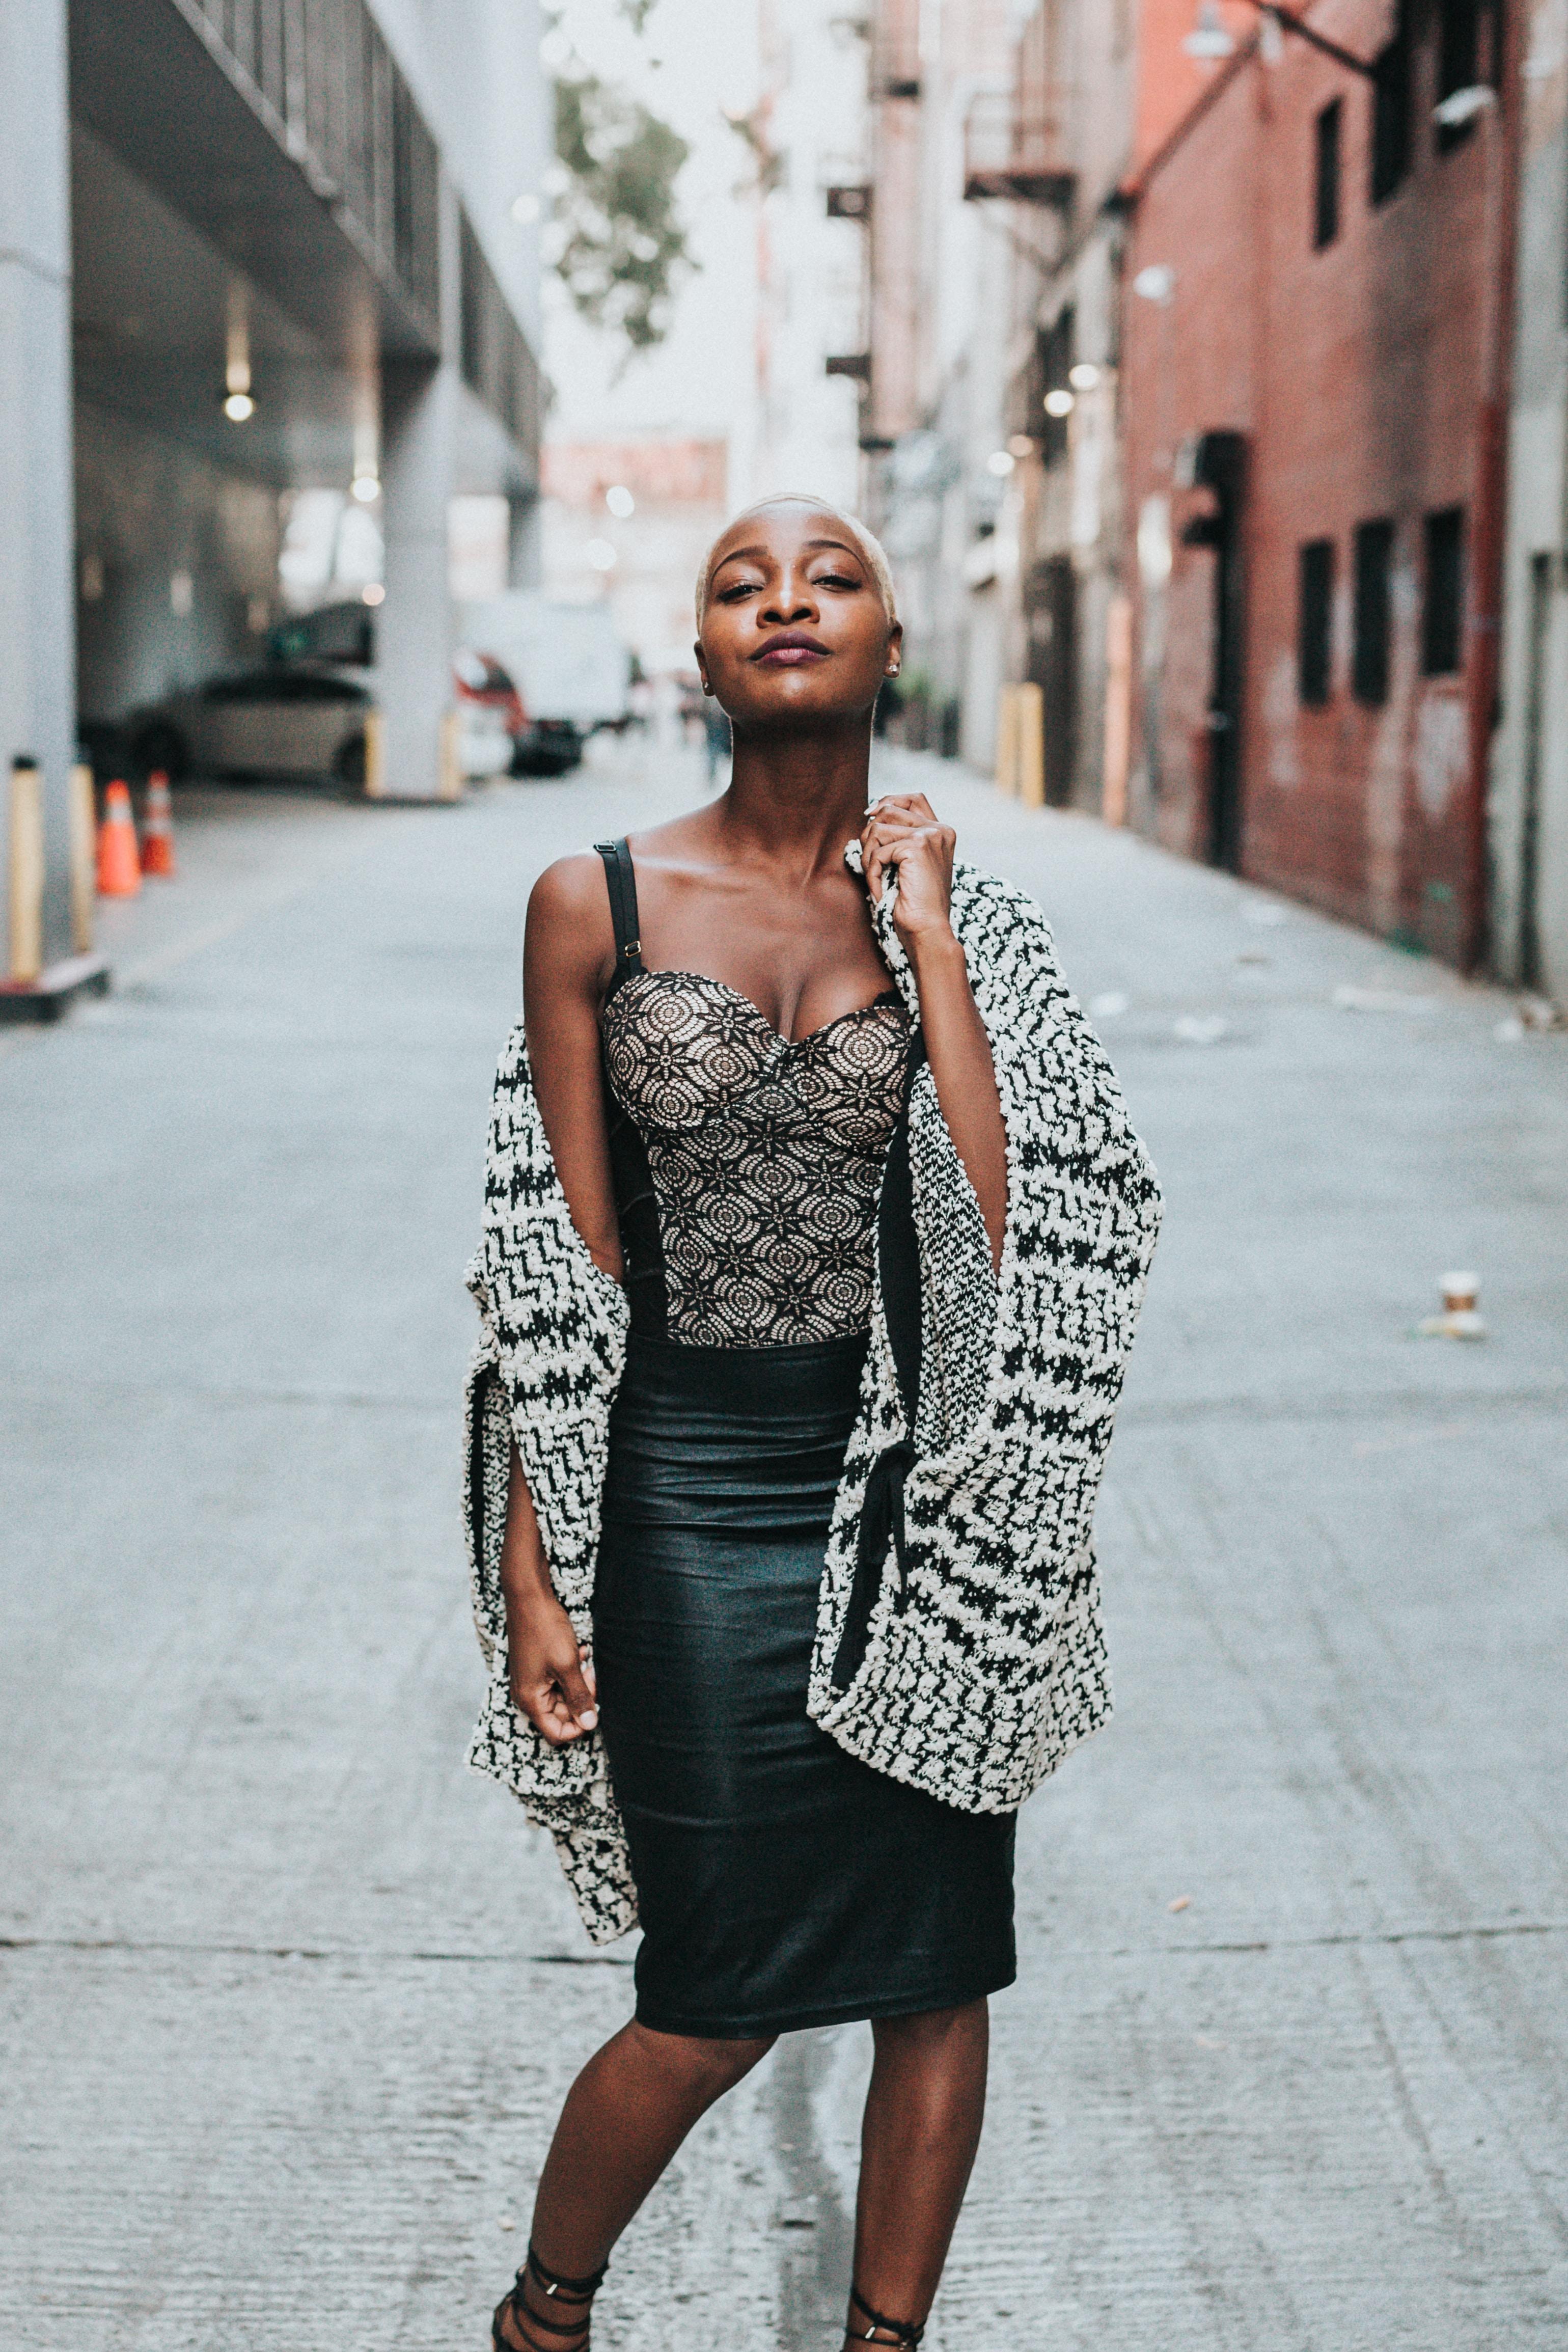 woman wearing black and gray dress standing between buildigs